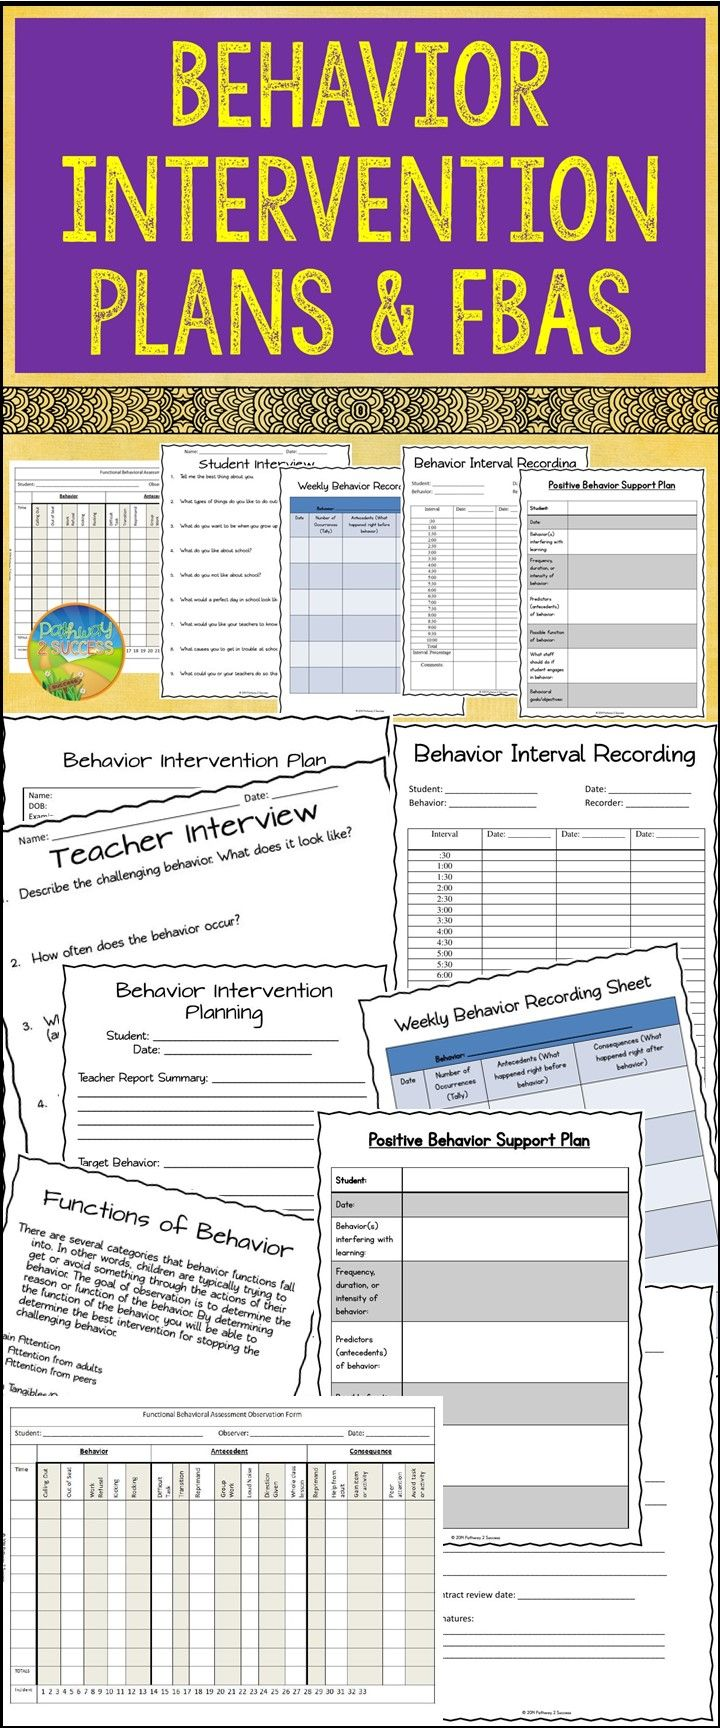 Behavior intervention plans, functional behavior assessments, and more